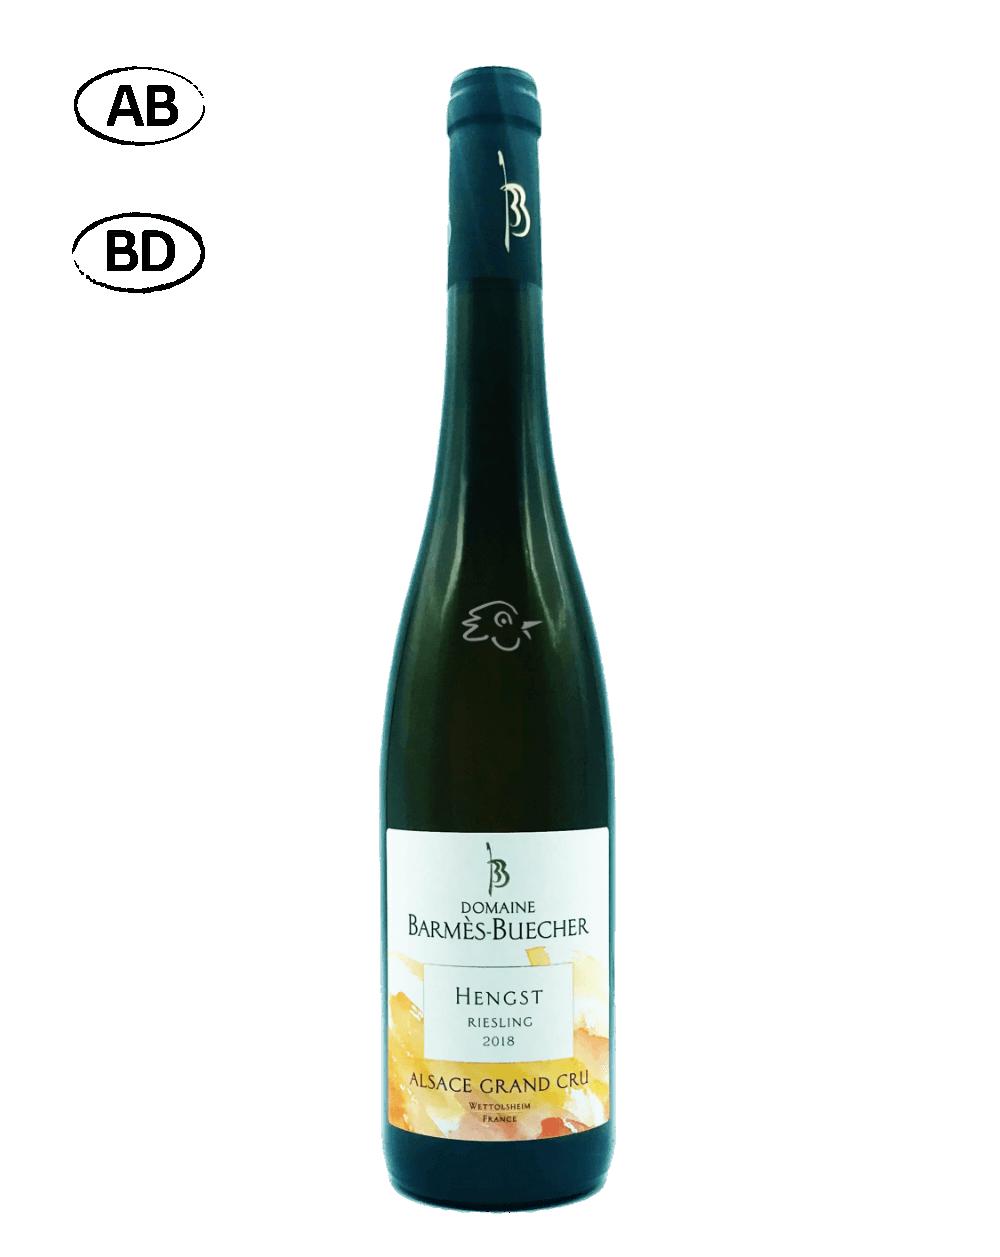 Domaine Barmès - Buecher - Riesling Grand Cru Hengst 2018 - Avintures